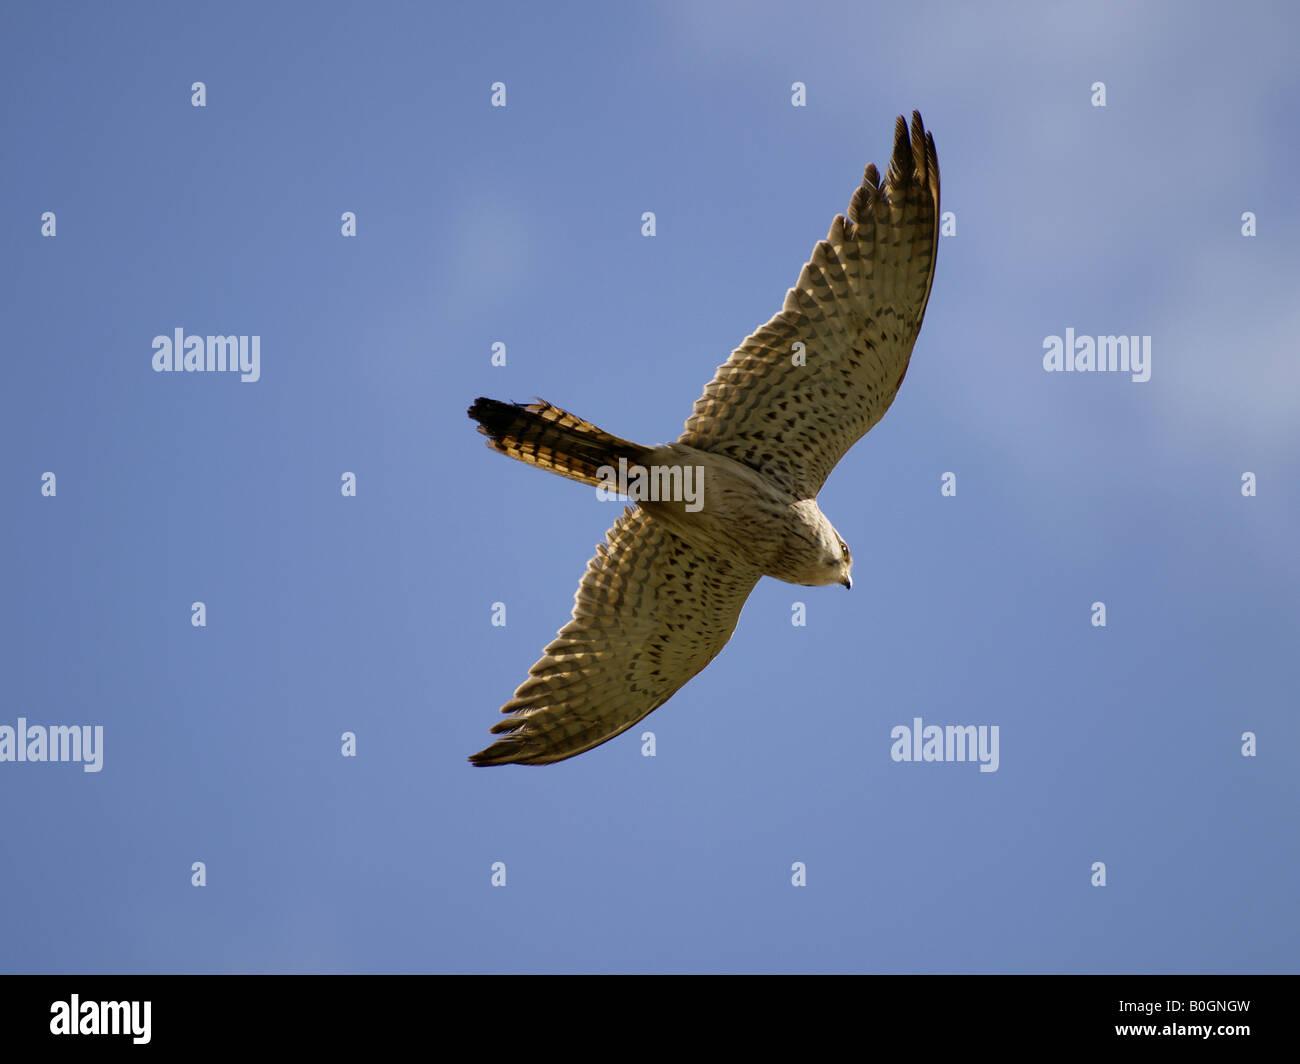 Female Kestrel, Falco tinnunculus, in flight searching for food. Cornwall, British Isles, UK - Stock Image